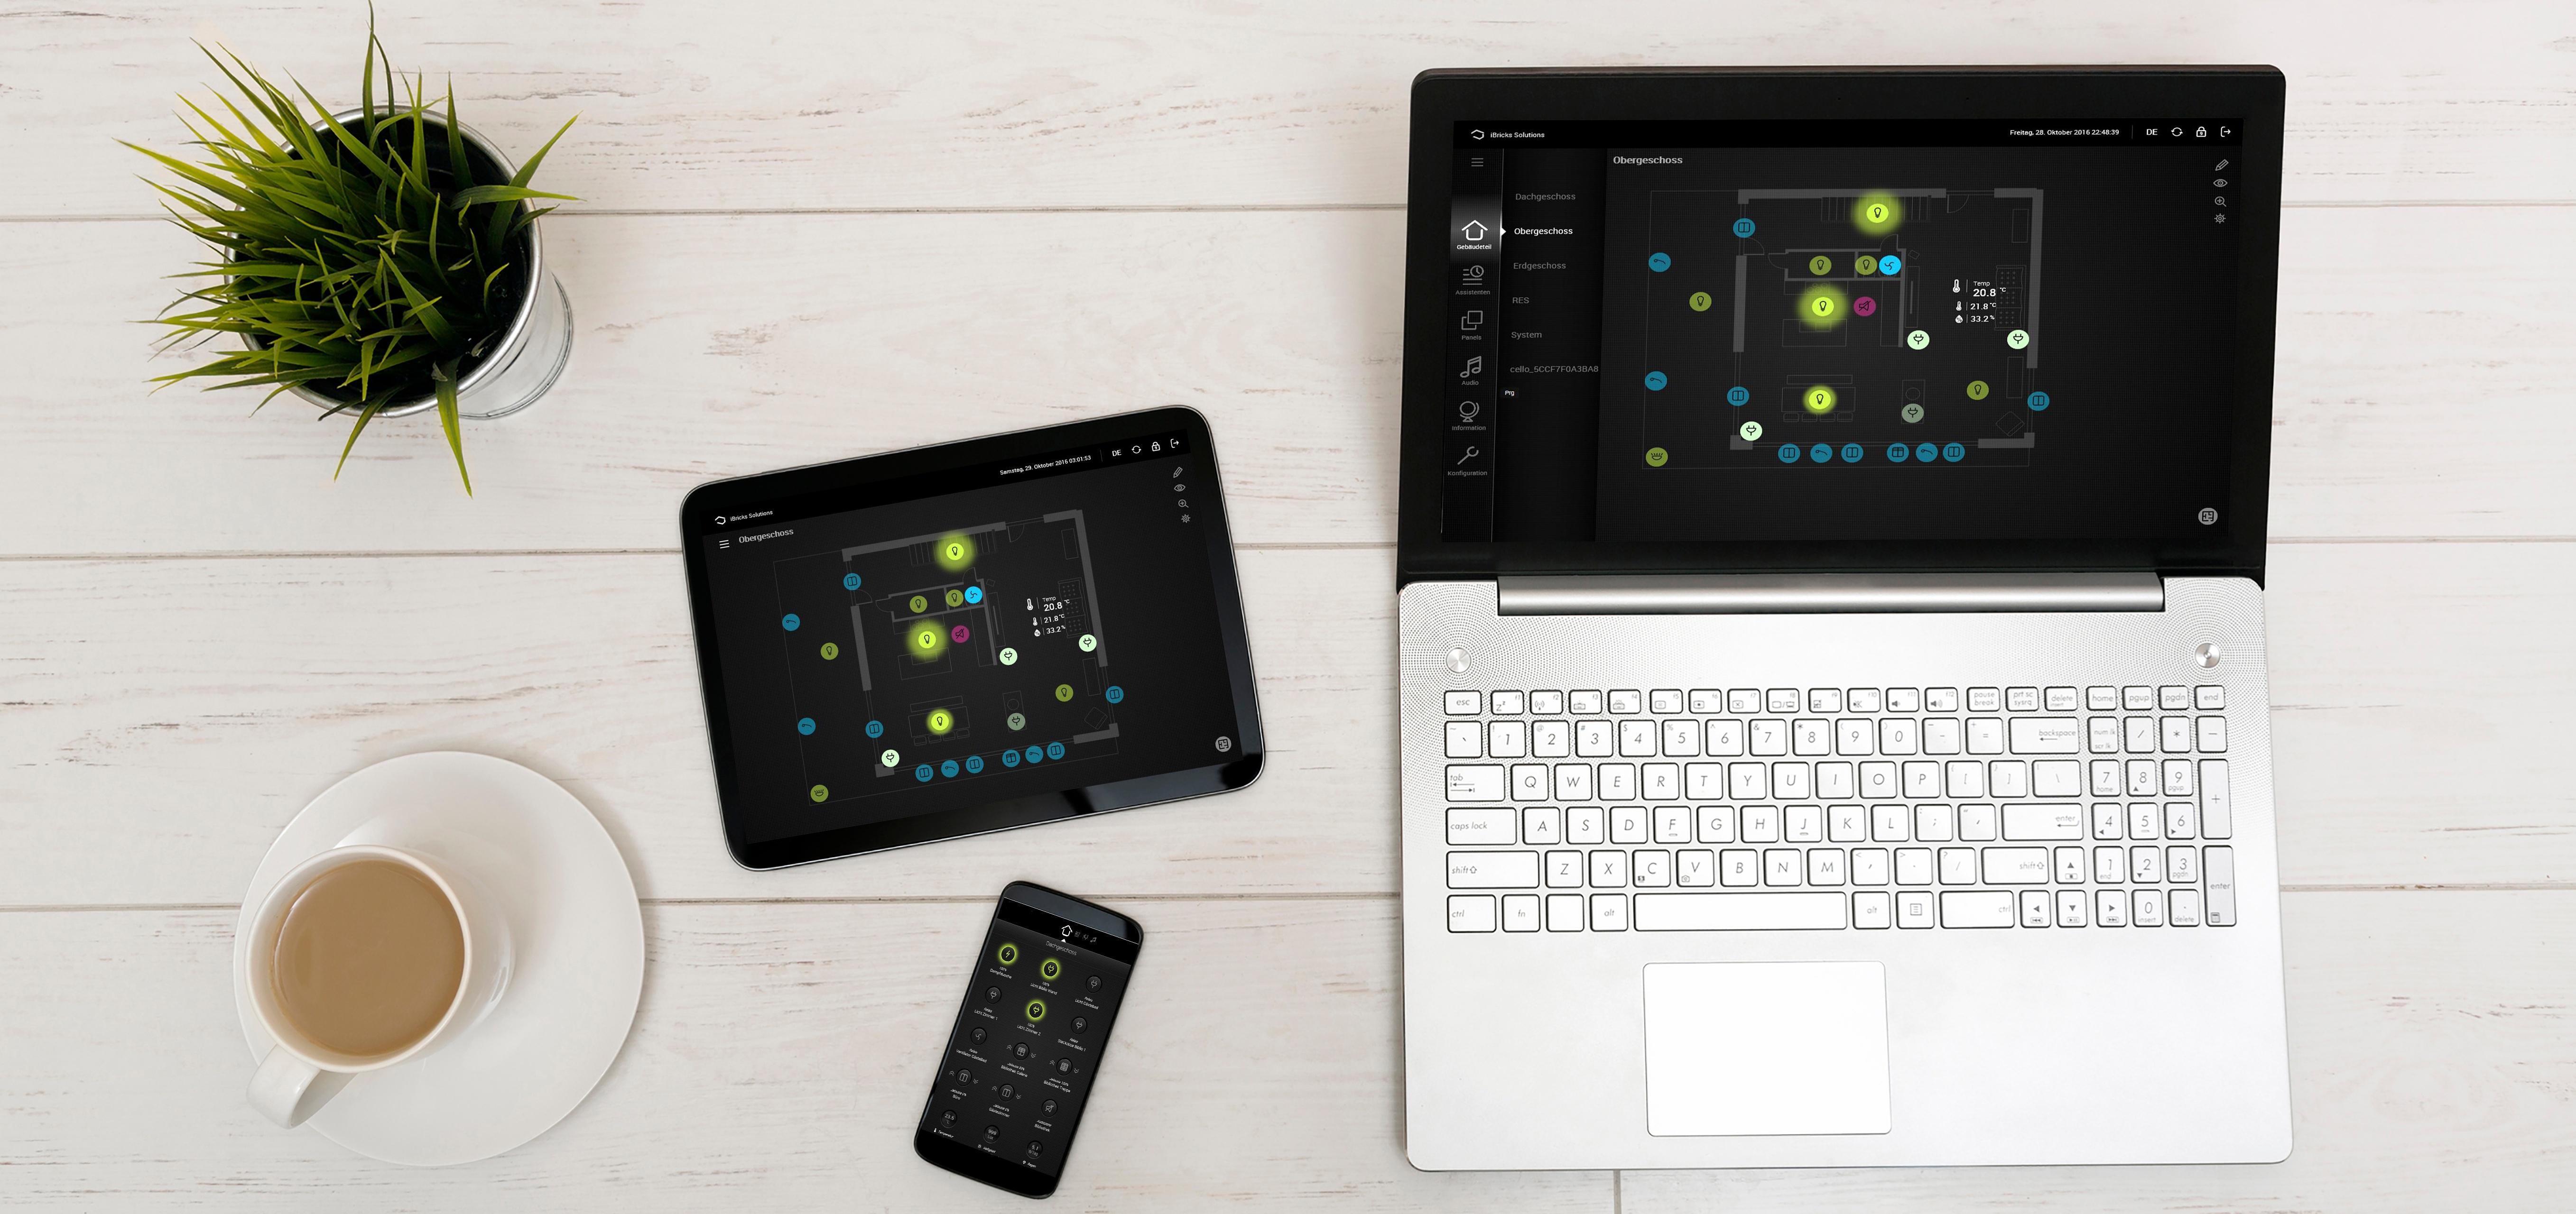 PC Tablet Handy Flach.jpg